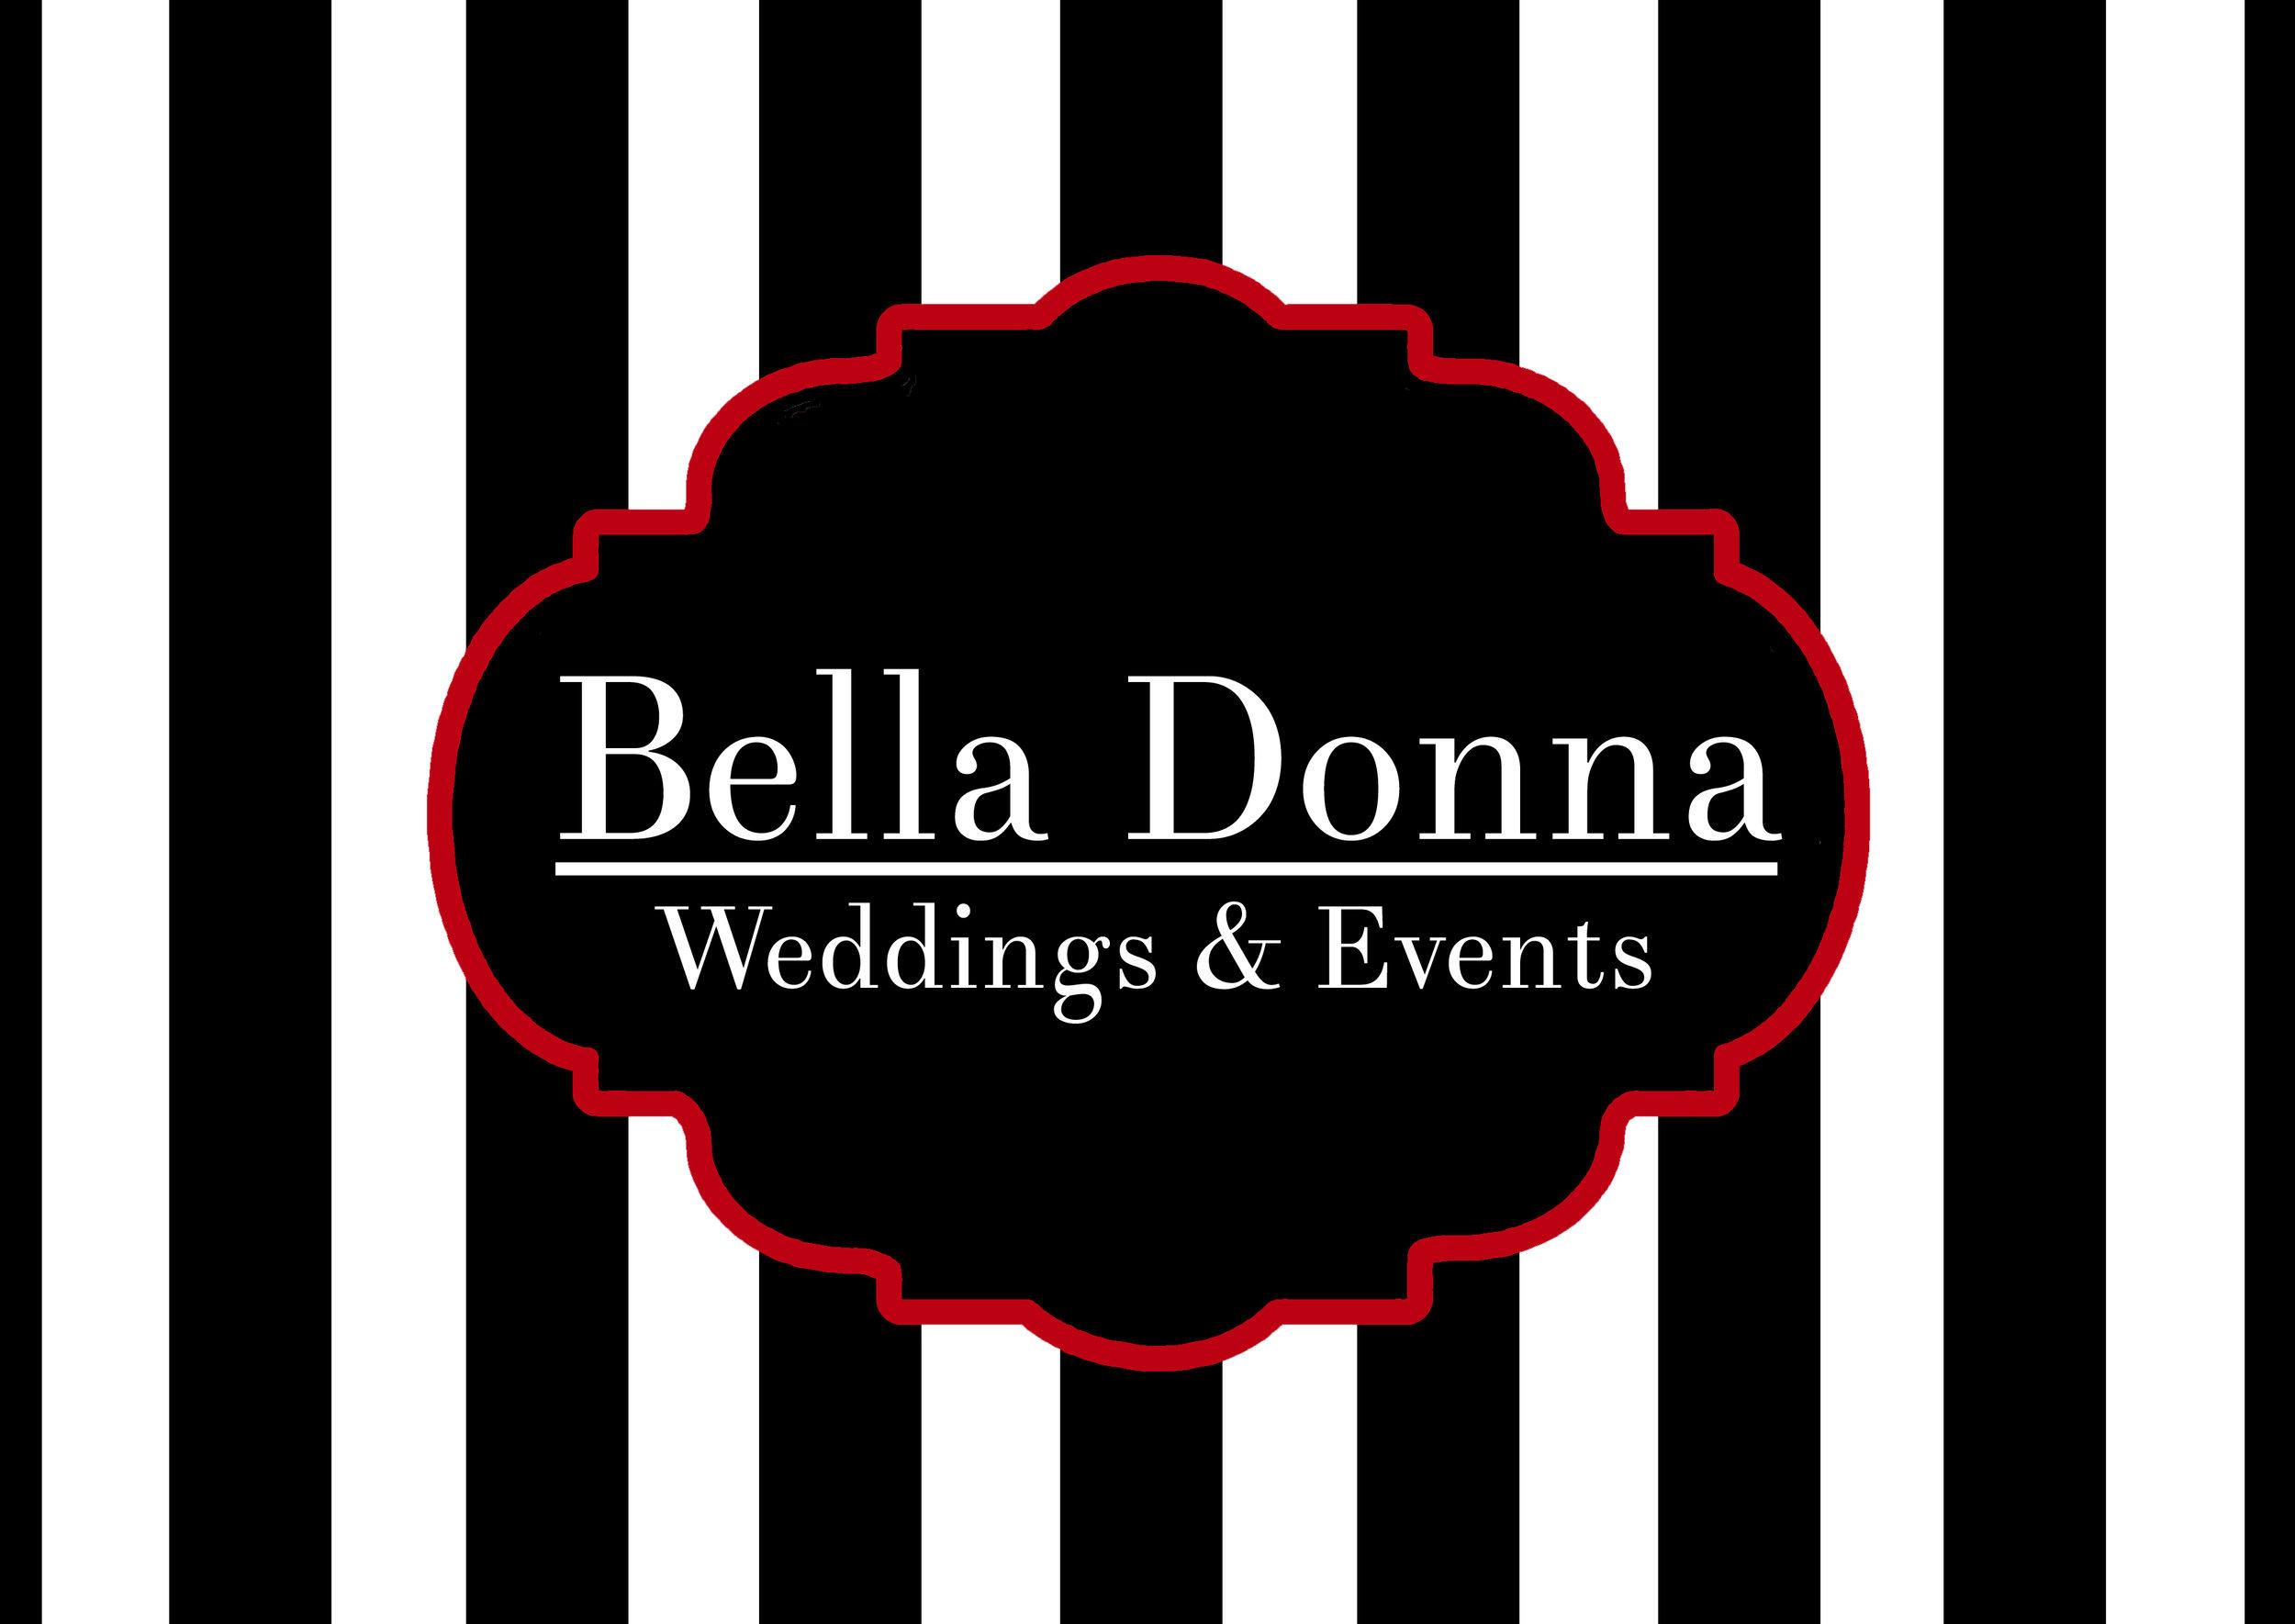 Bella Donna Weddings & Events  Wedding & Event Planning   www.BellaDonnaWeddings.com   973.951.9081   BellaDonnaWeddings@yahoo.com